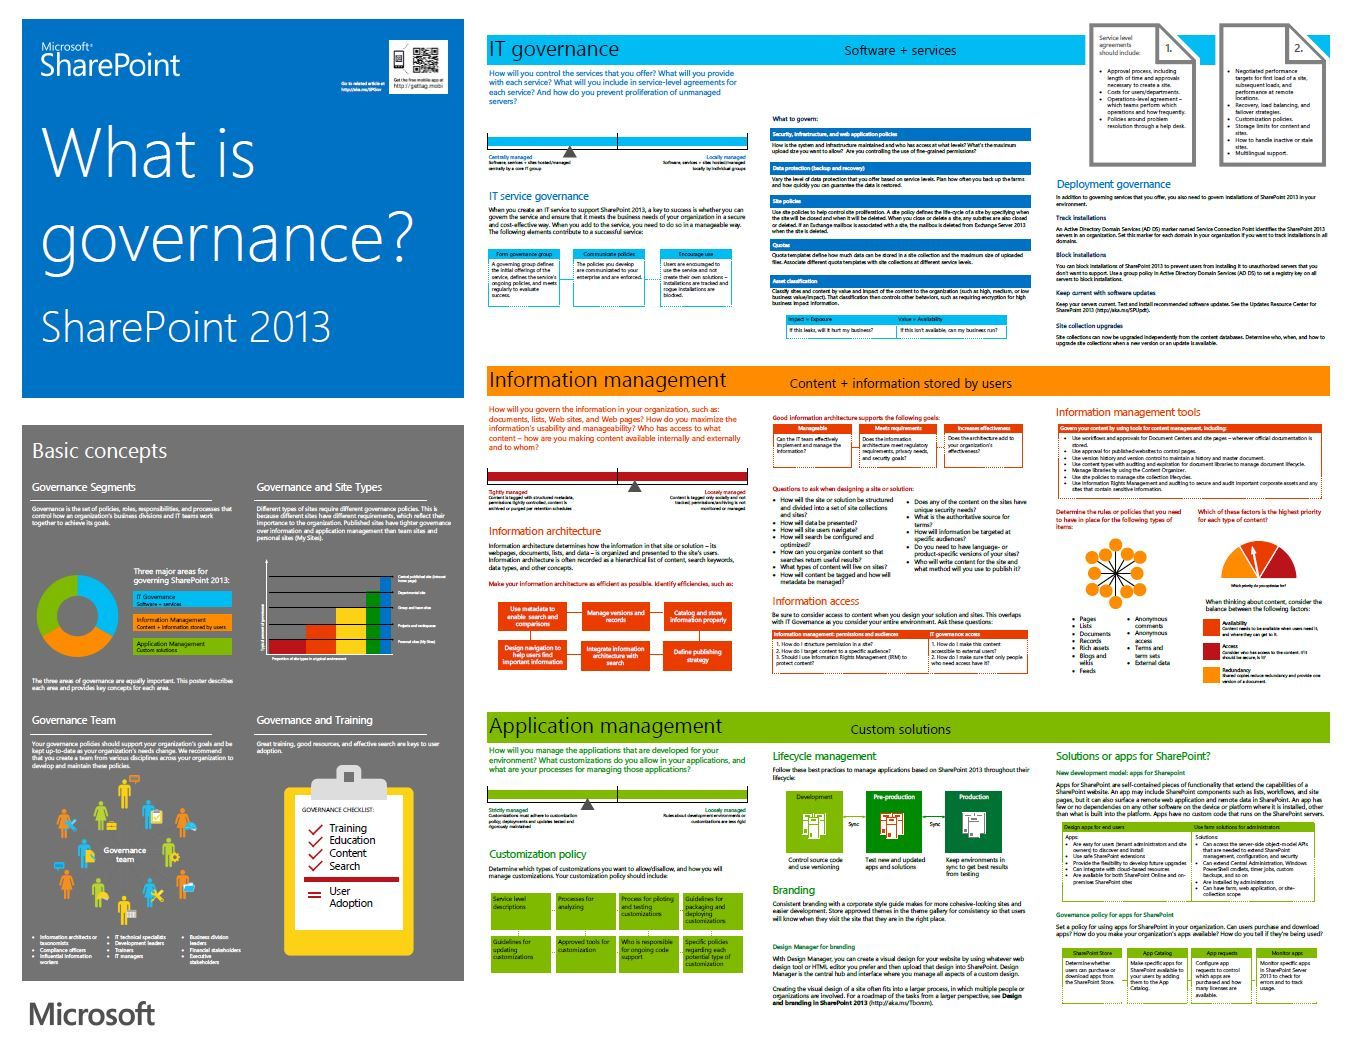 sharepoint governance - Google zoeken | SharePoint | Pinterest